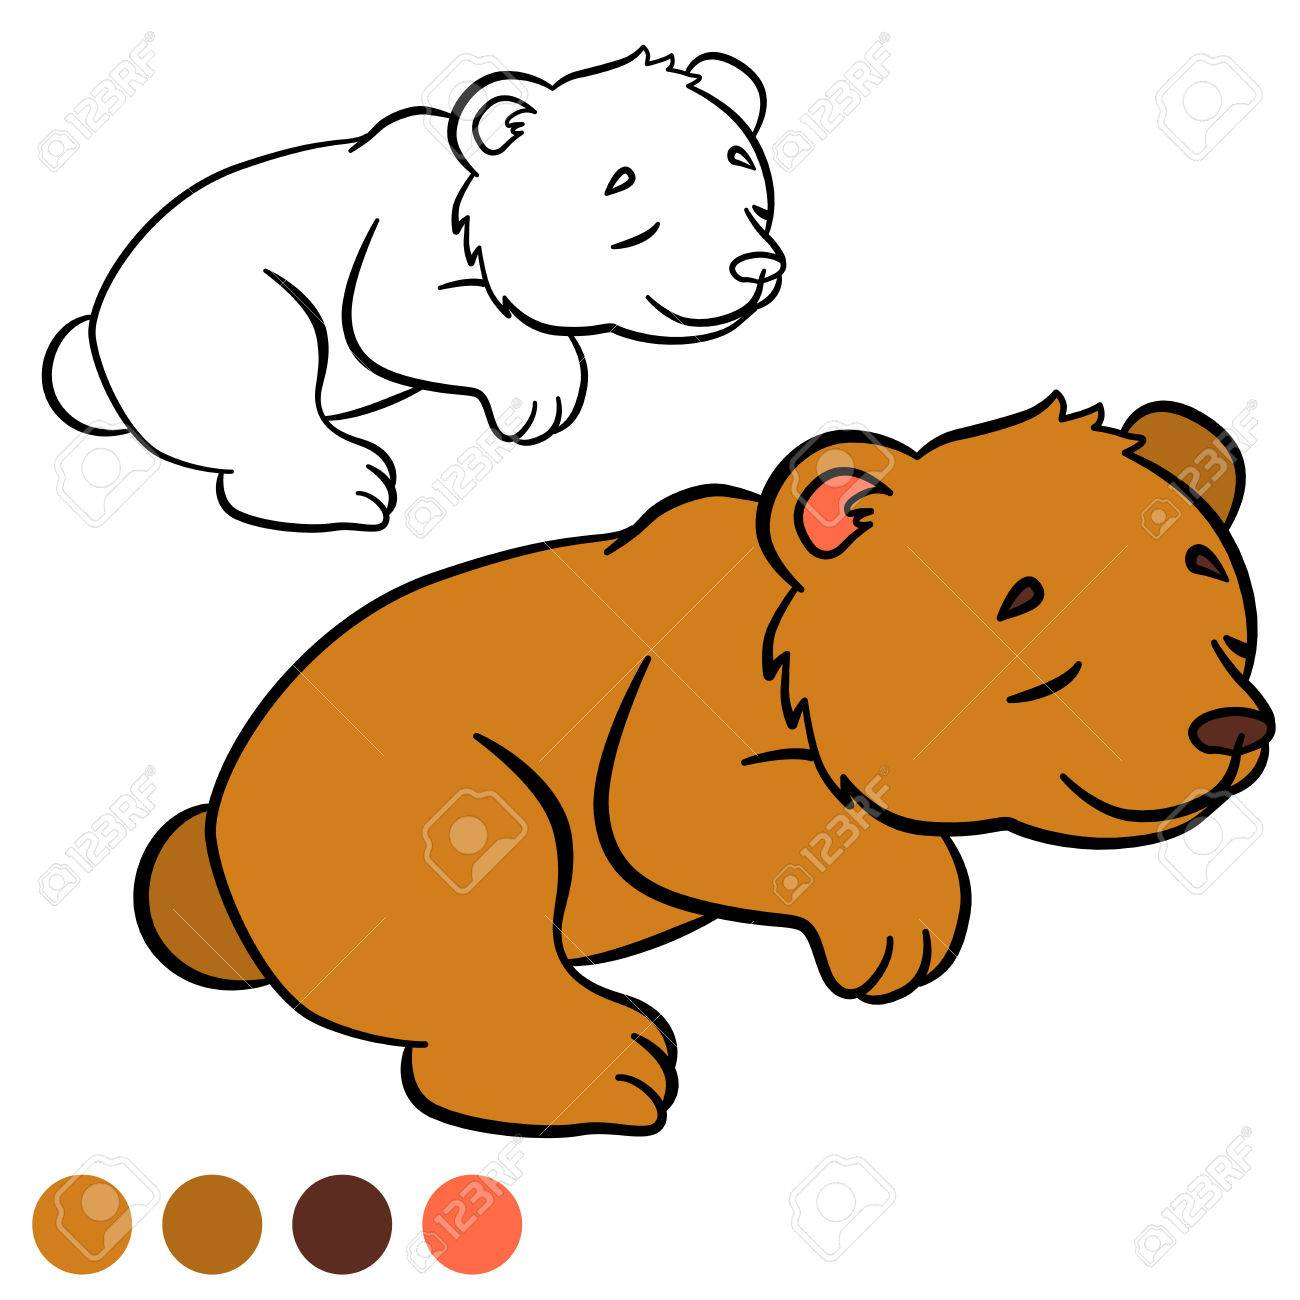 Dibujo Para Colorear. Color Me: Oso. Pequeño Oso Lindo Bebé Duerme ...